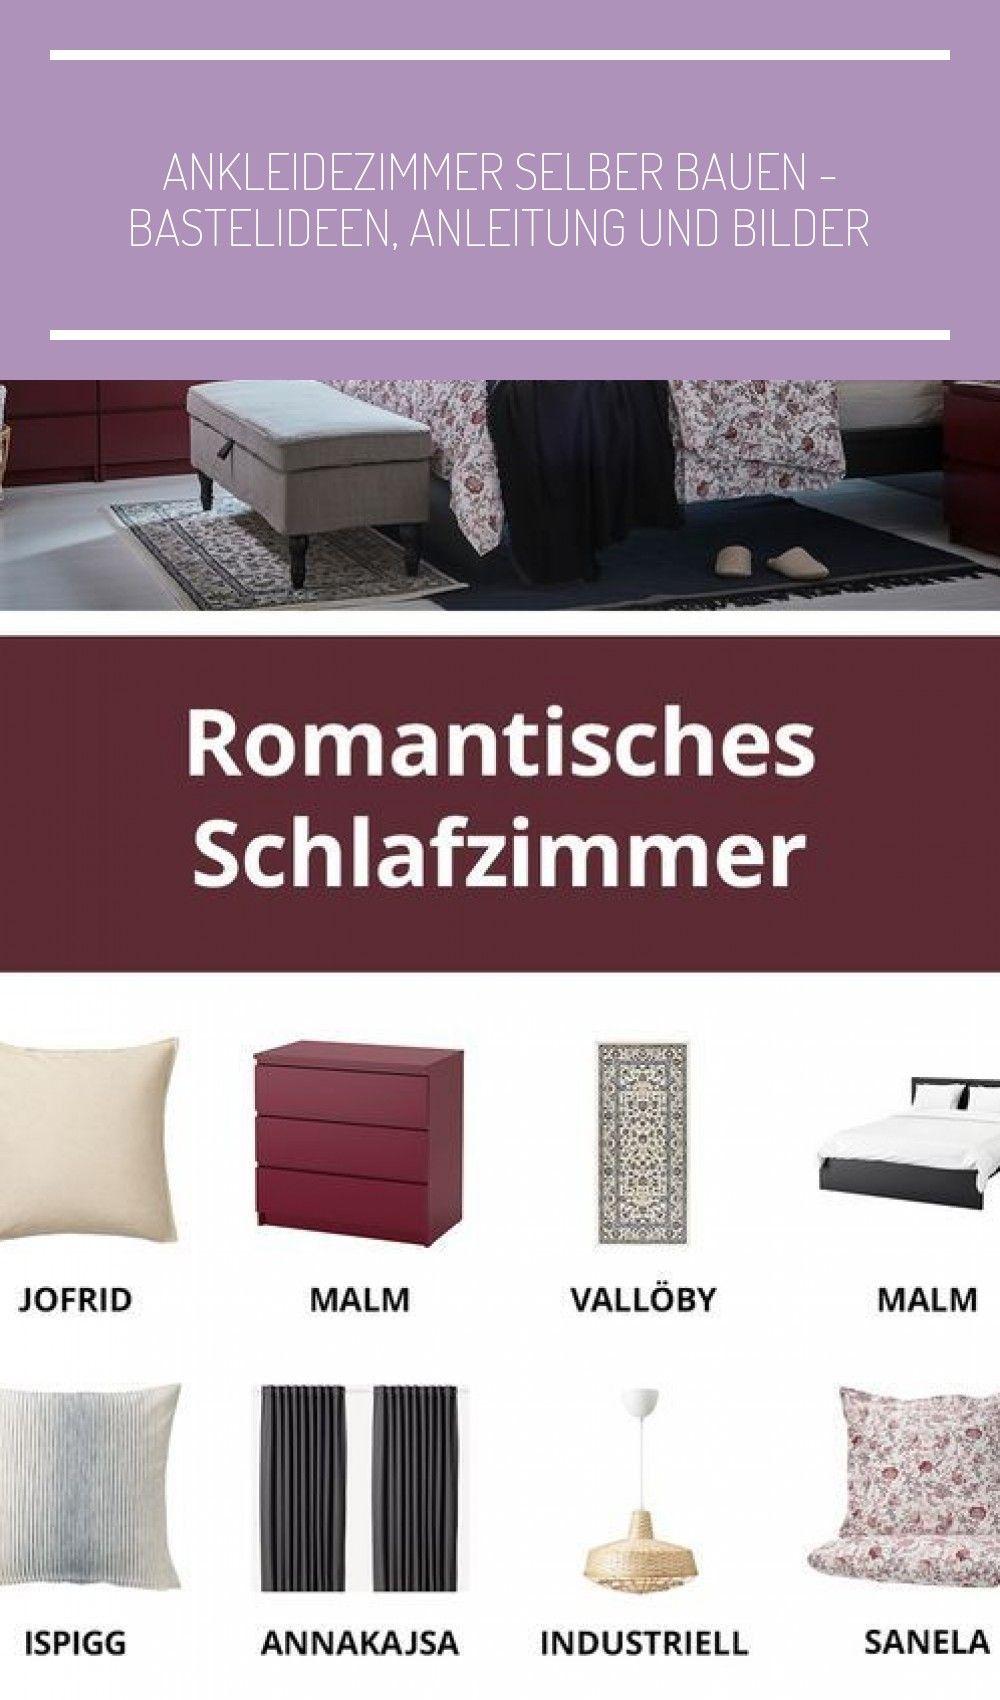 Ankleidezimmer Selber Bauen In 2020 Linen Bedding Floral Wallpaper Ikea